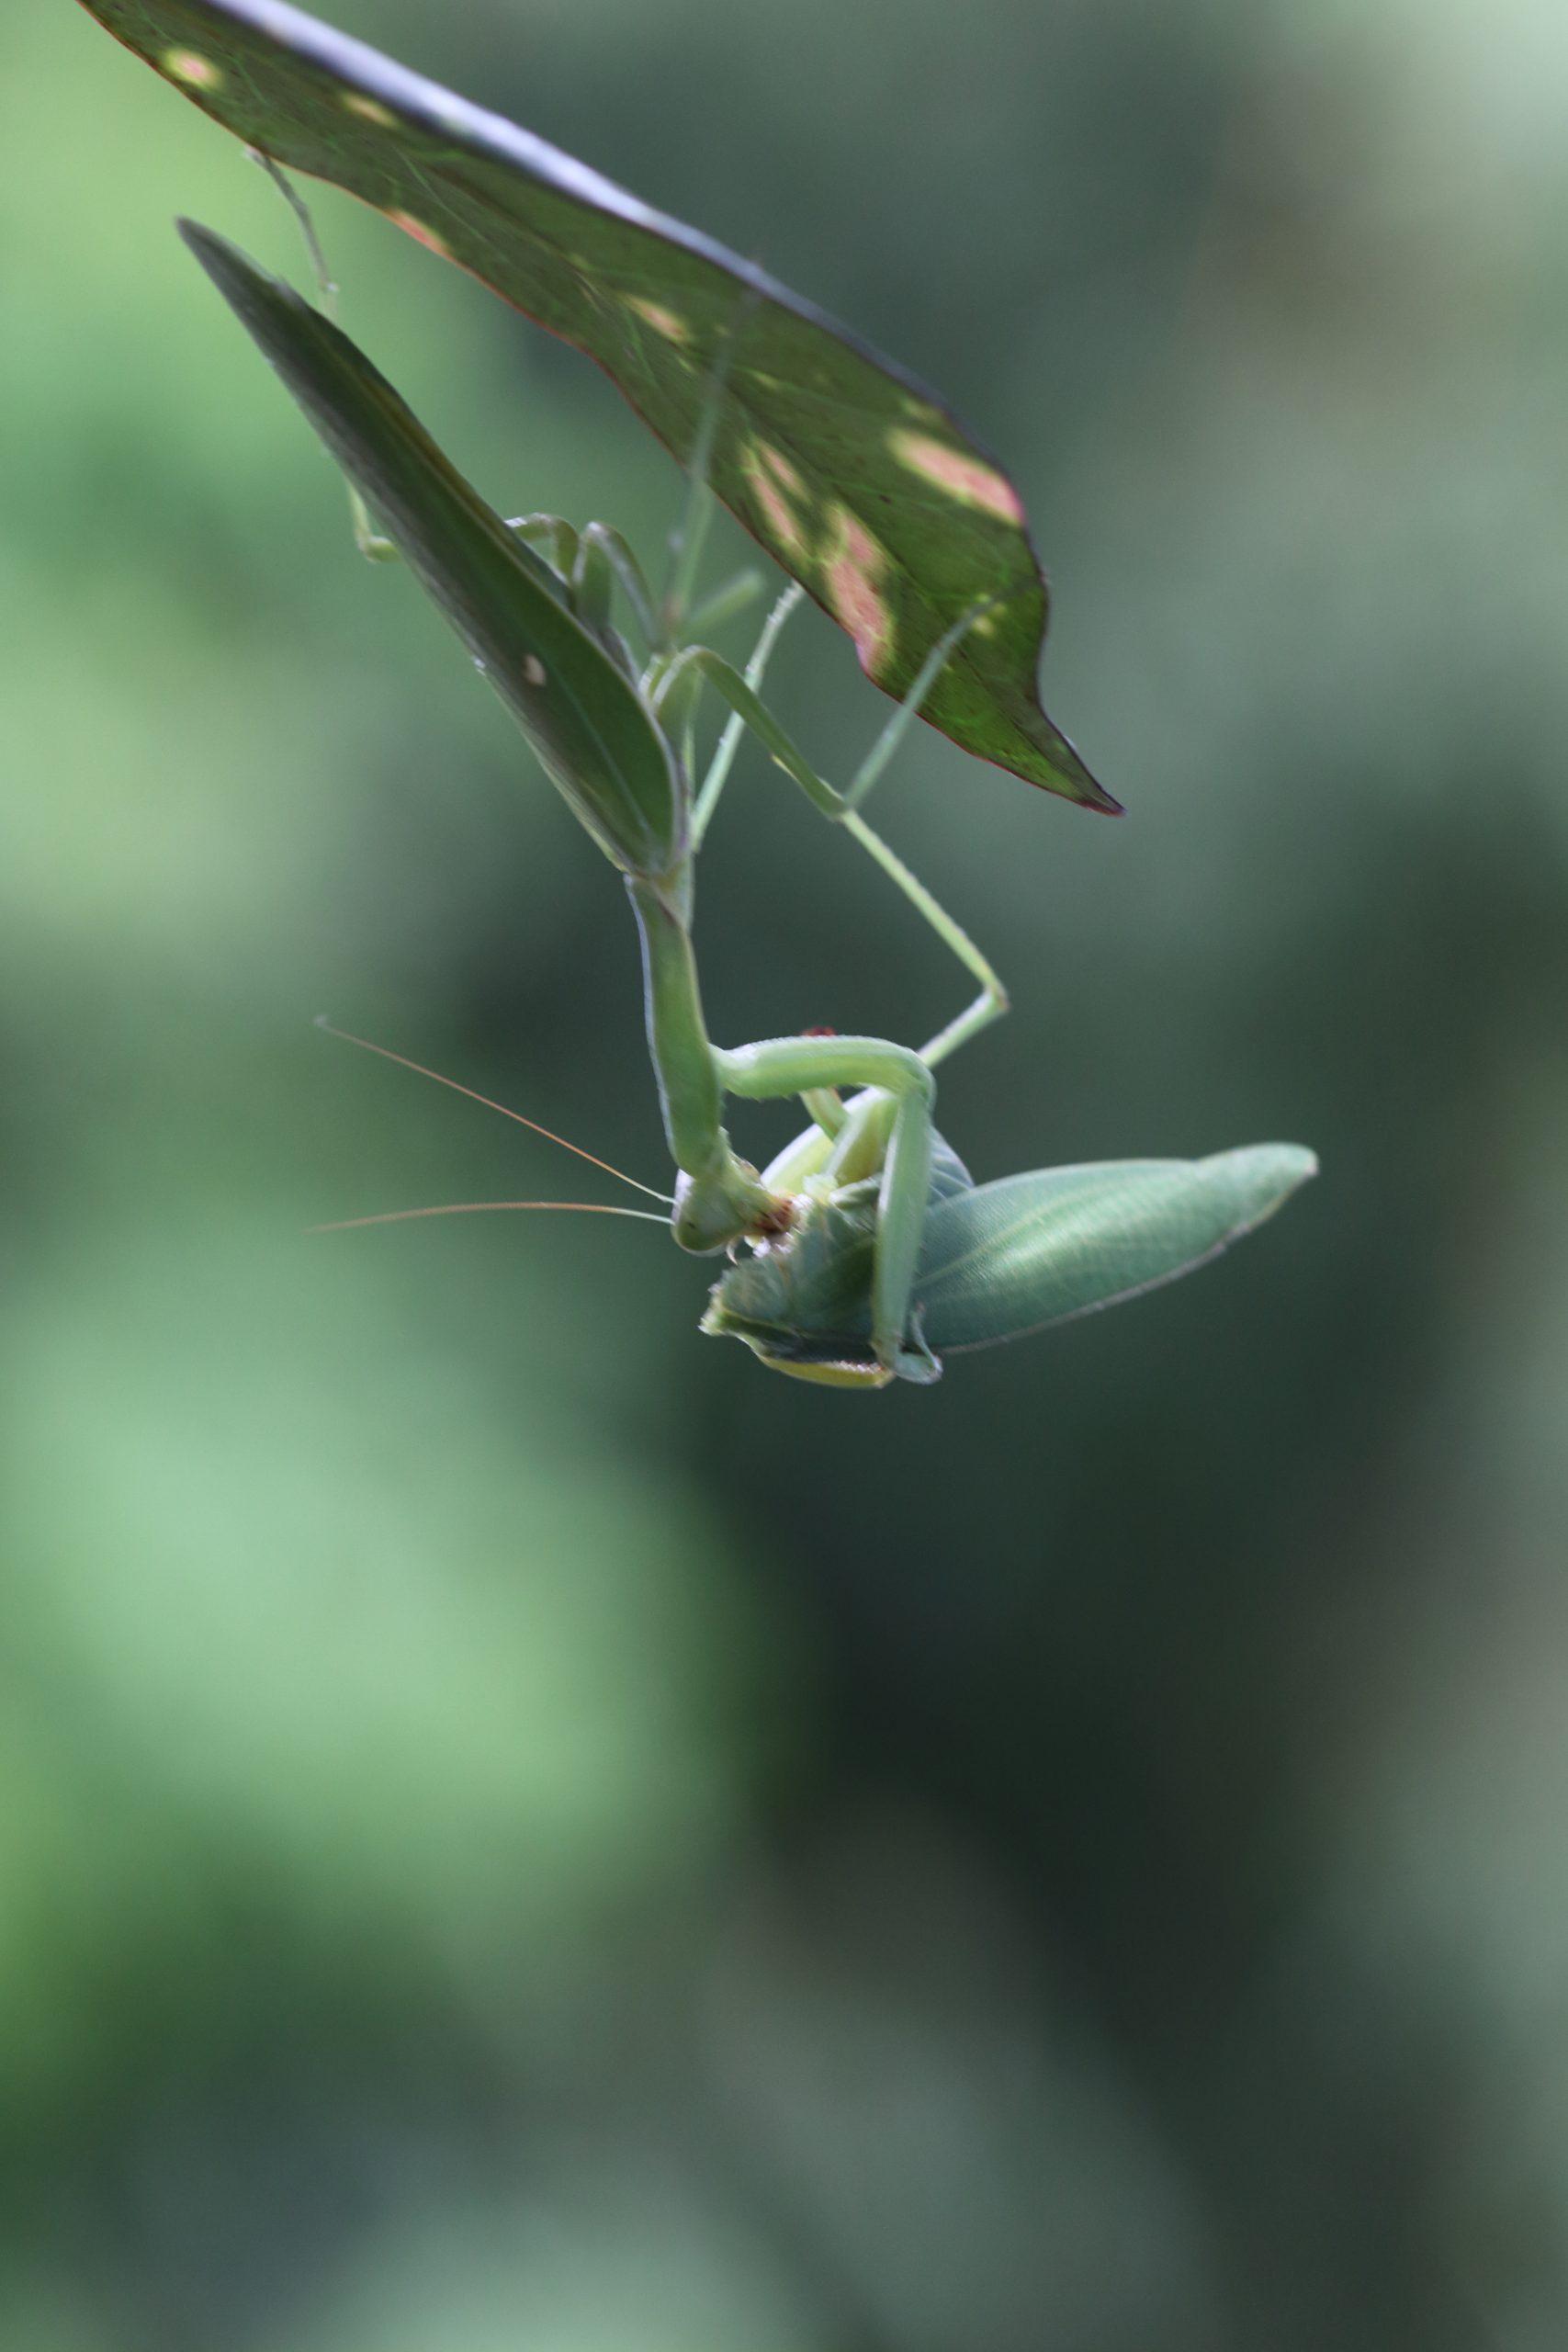 A mantis on a leaf